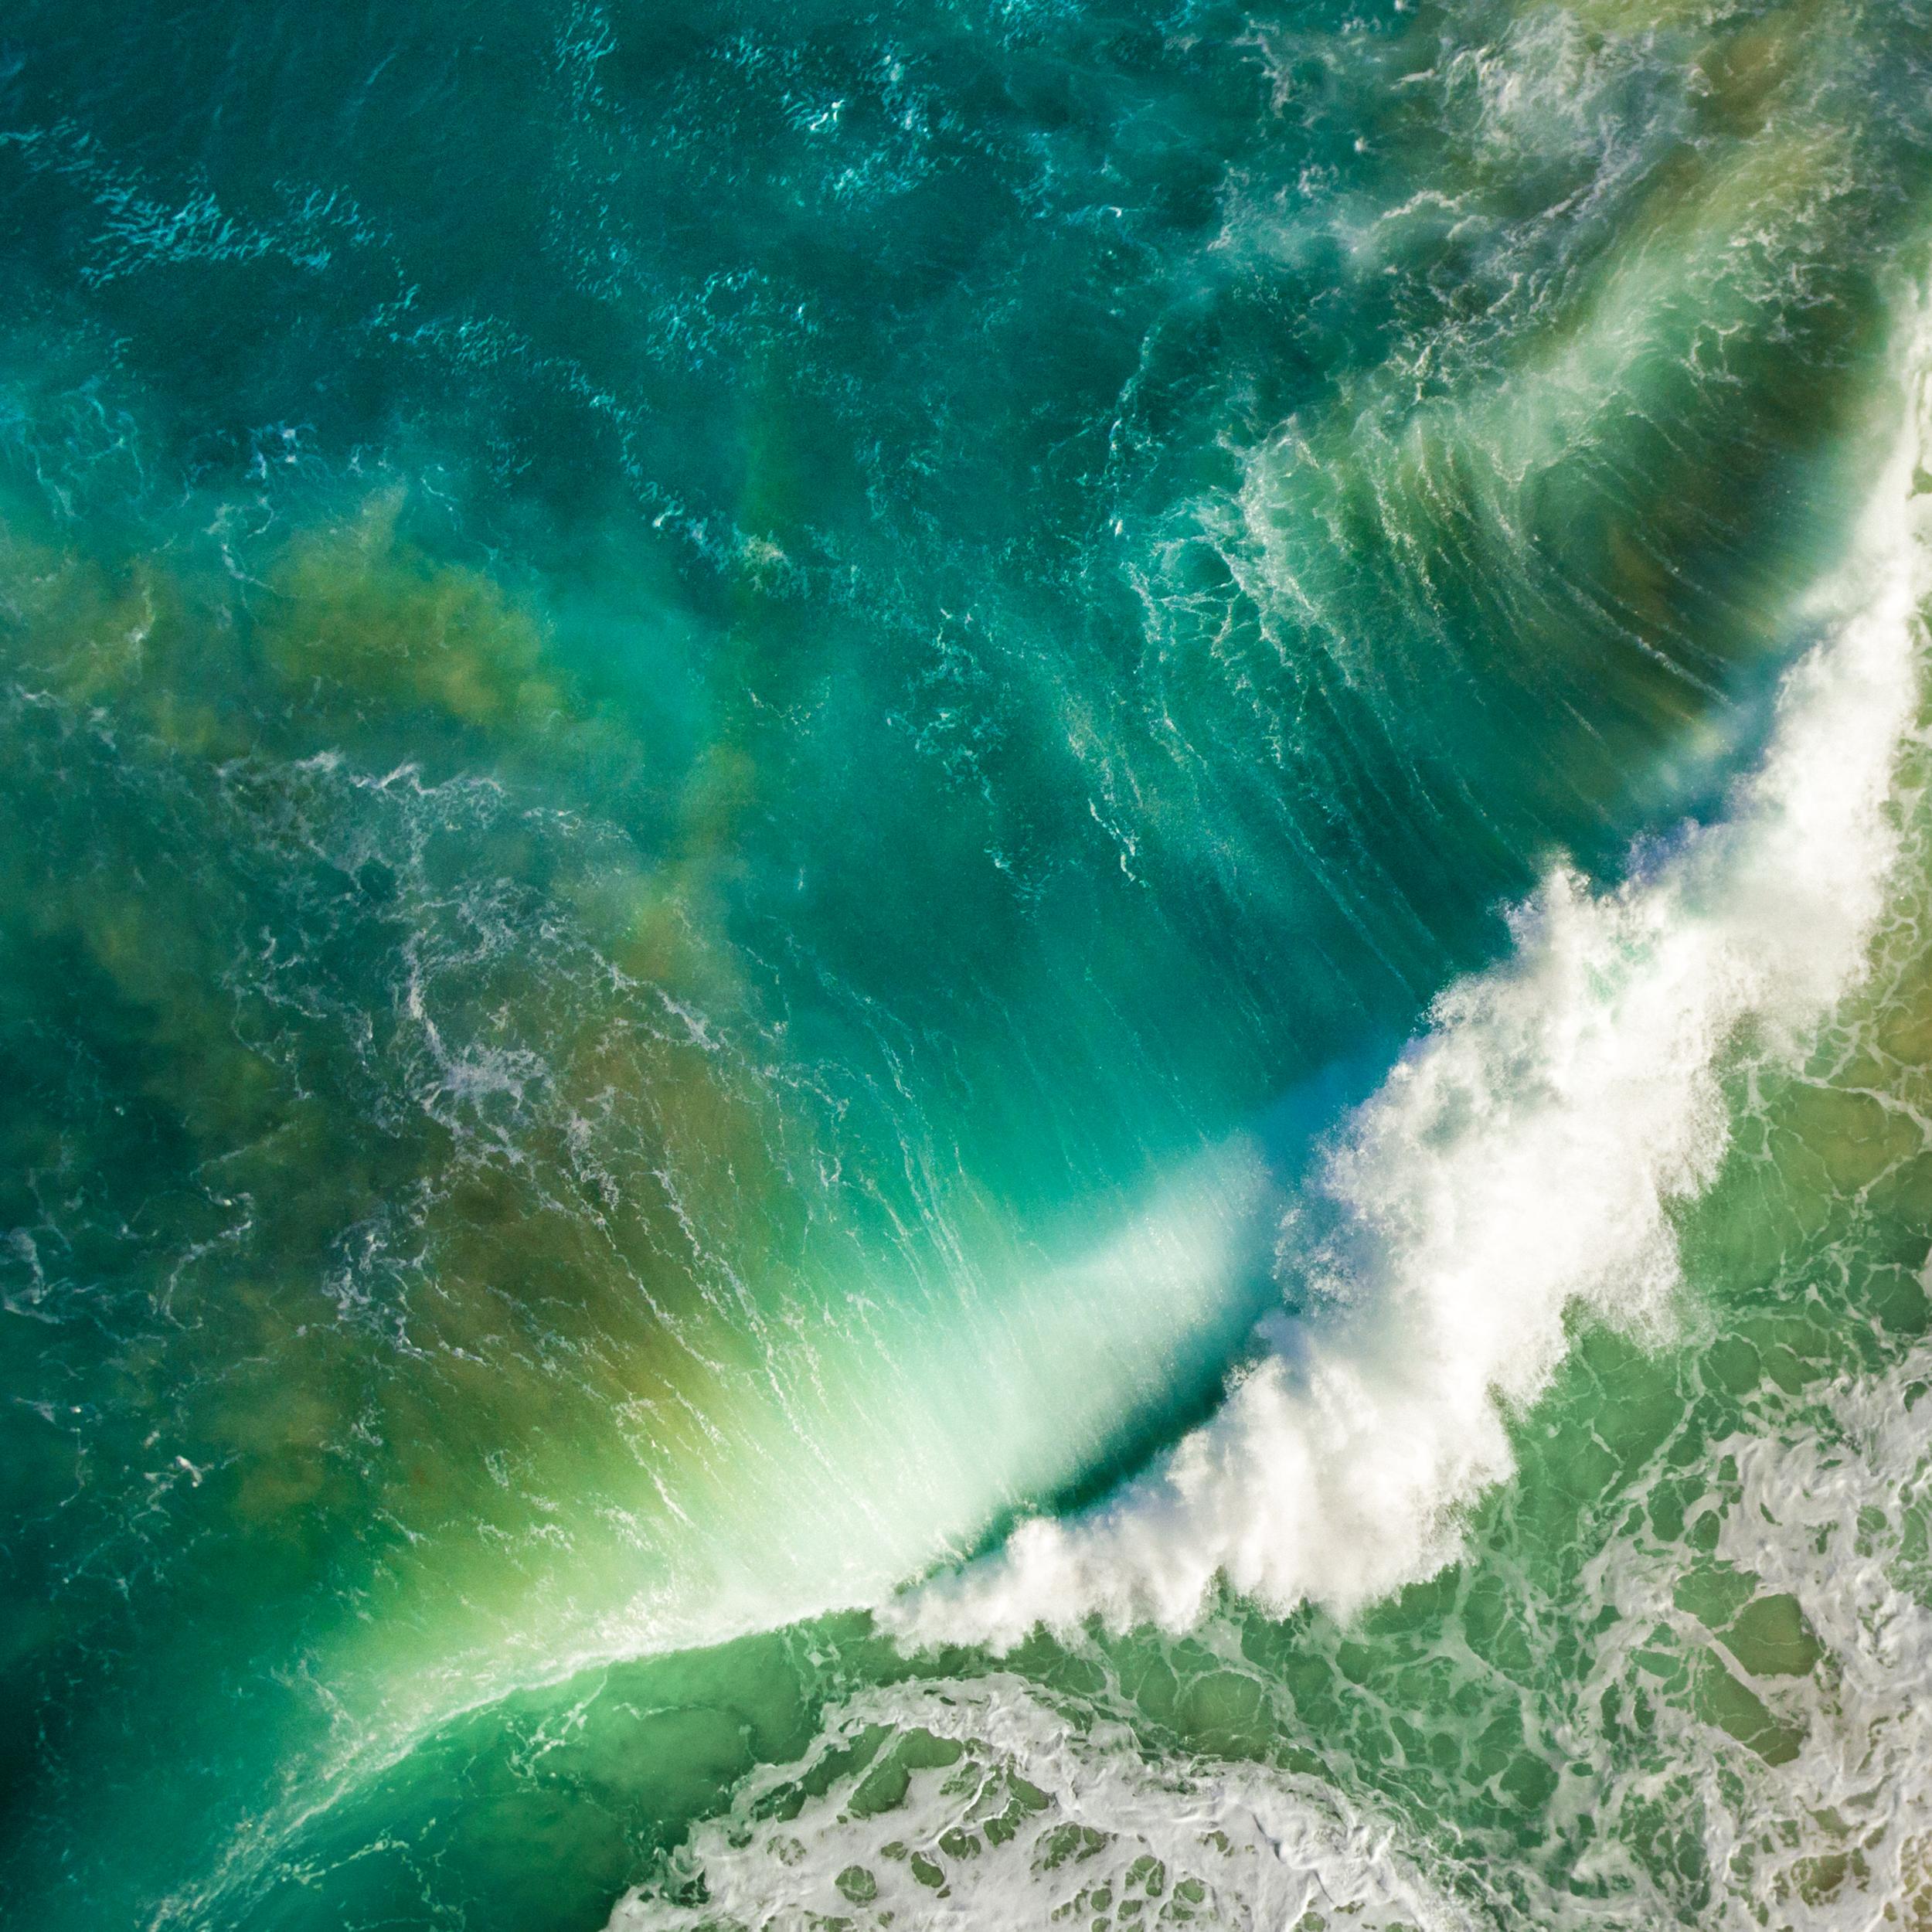 iPhone 6/6s iOS 10 Wallpaper